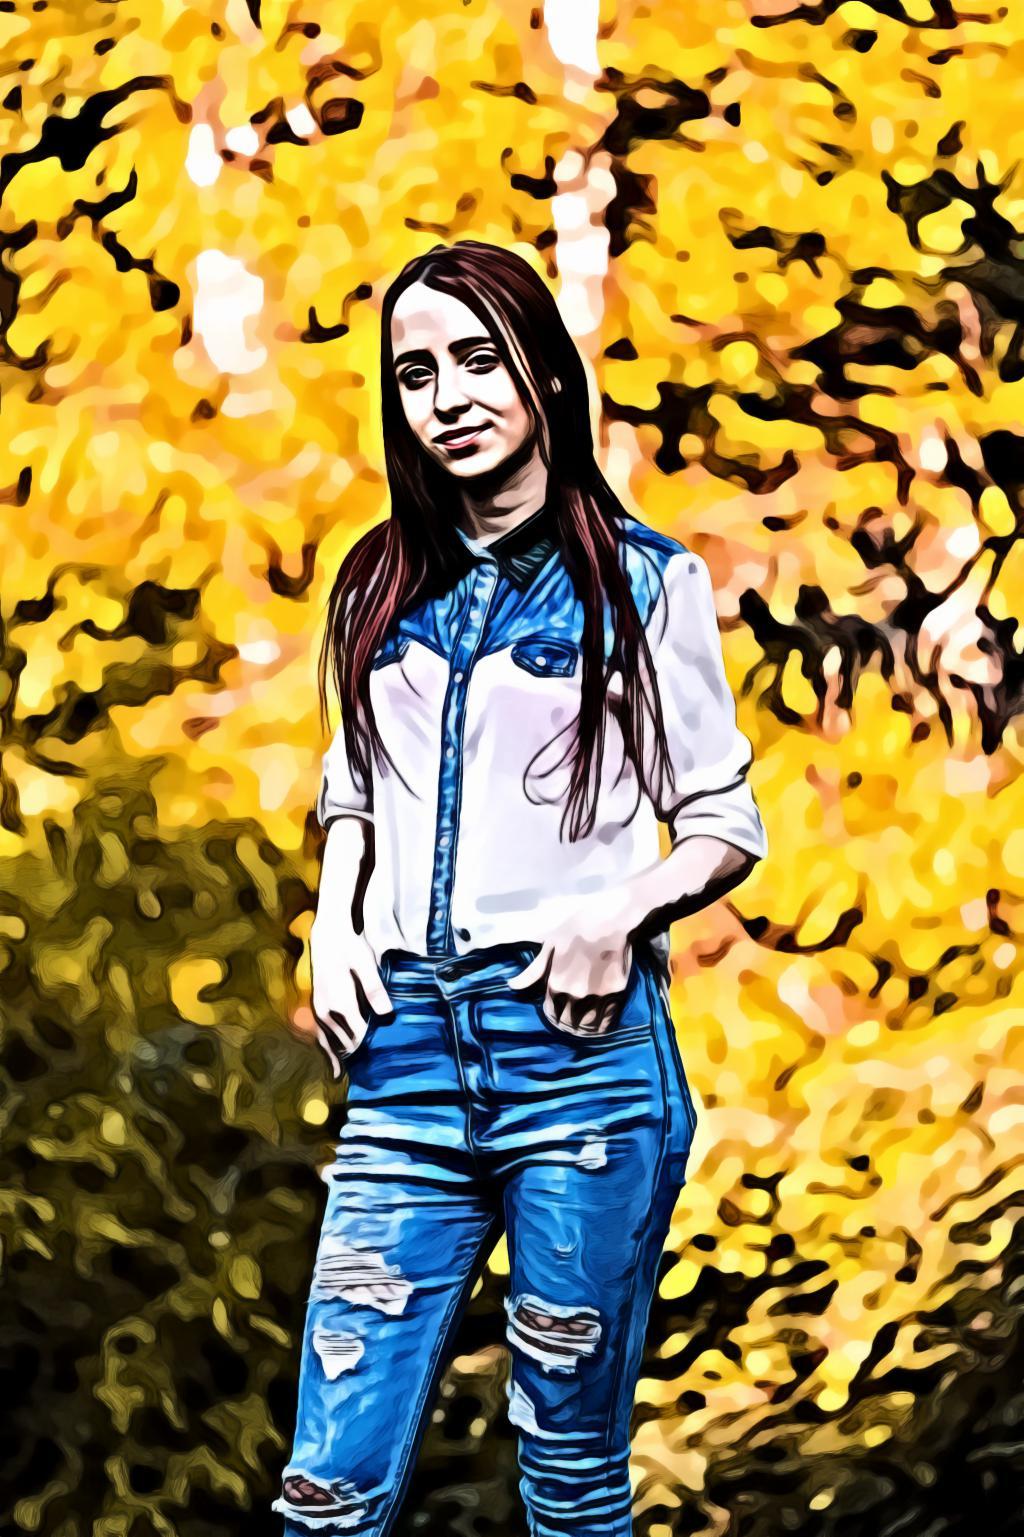 Brunette Woman In Blue Ripped Jeans